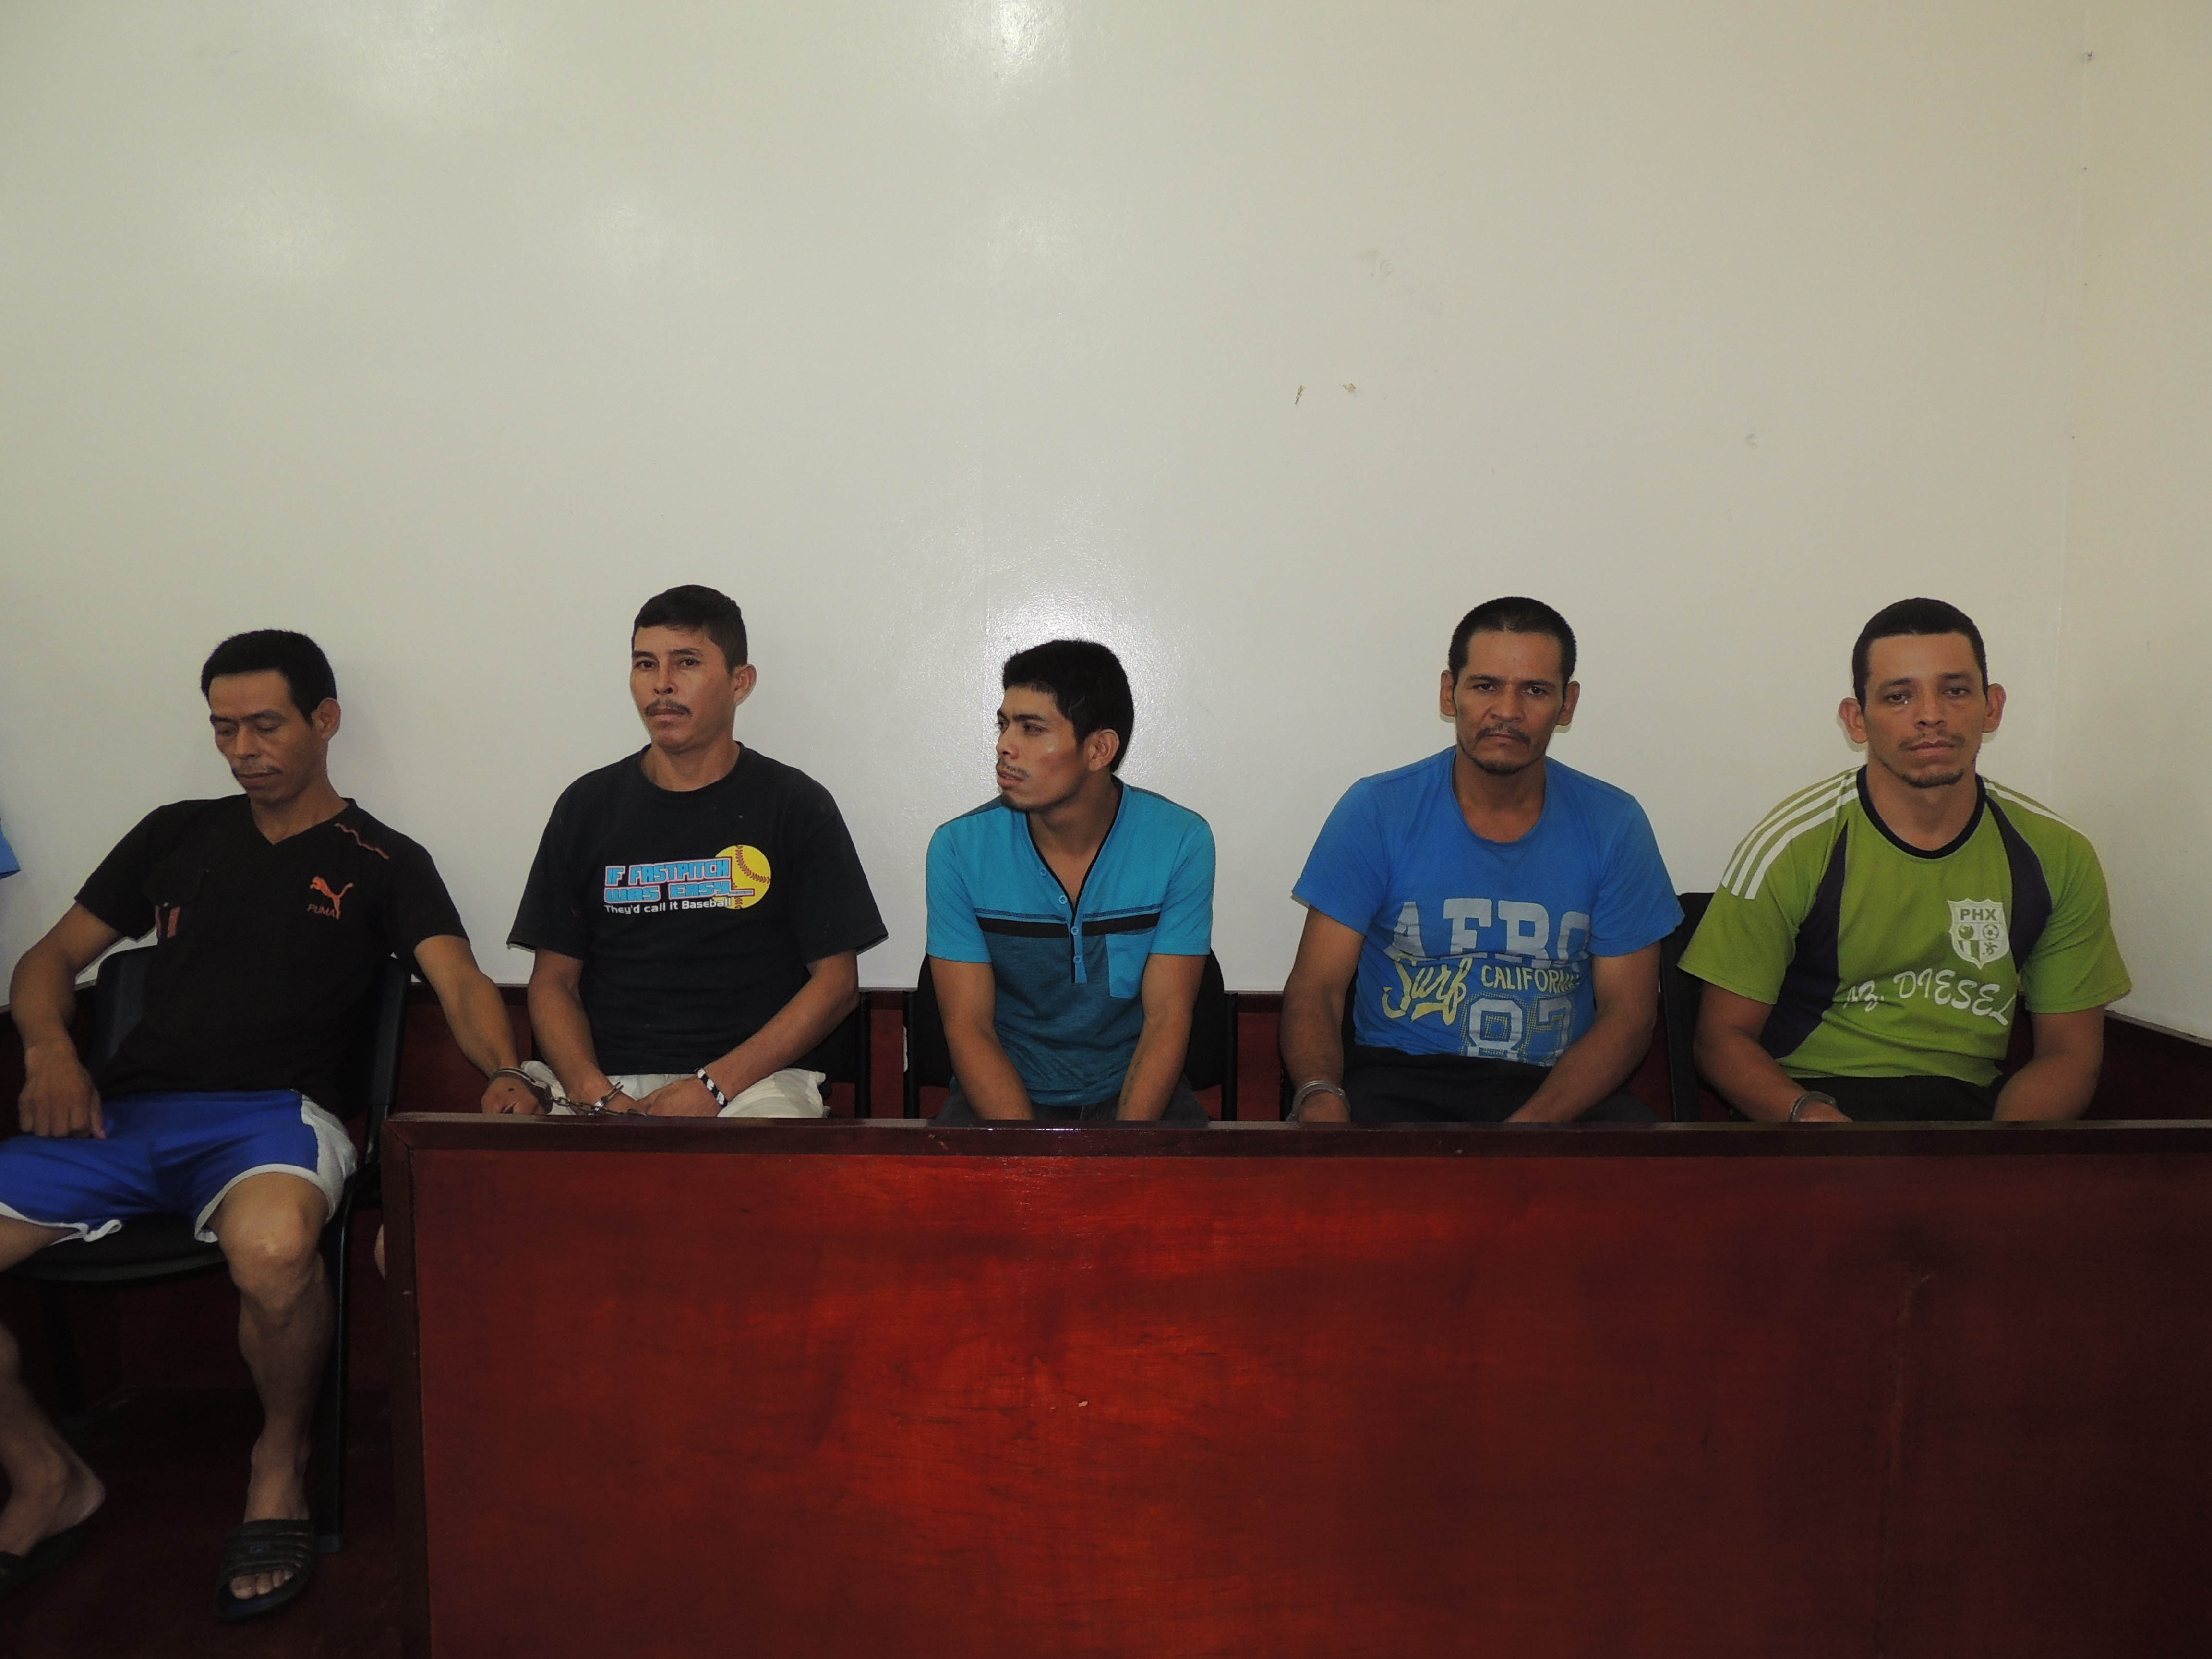 Matagalpa, banda de asaltantes